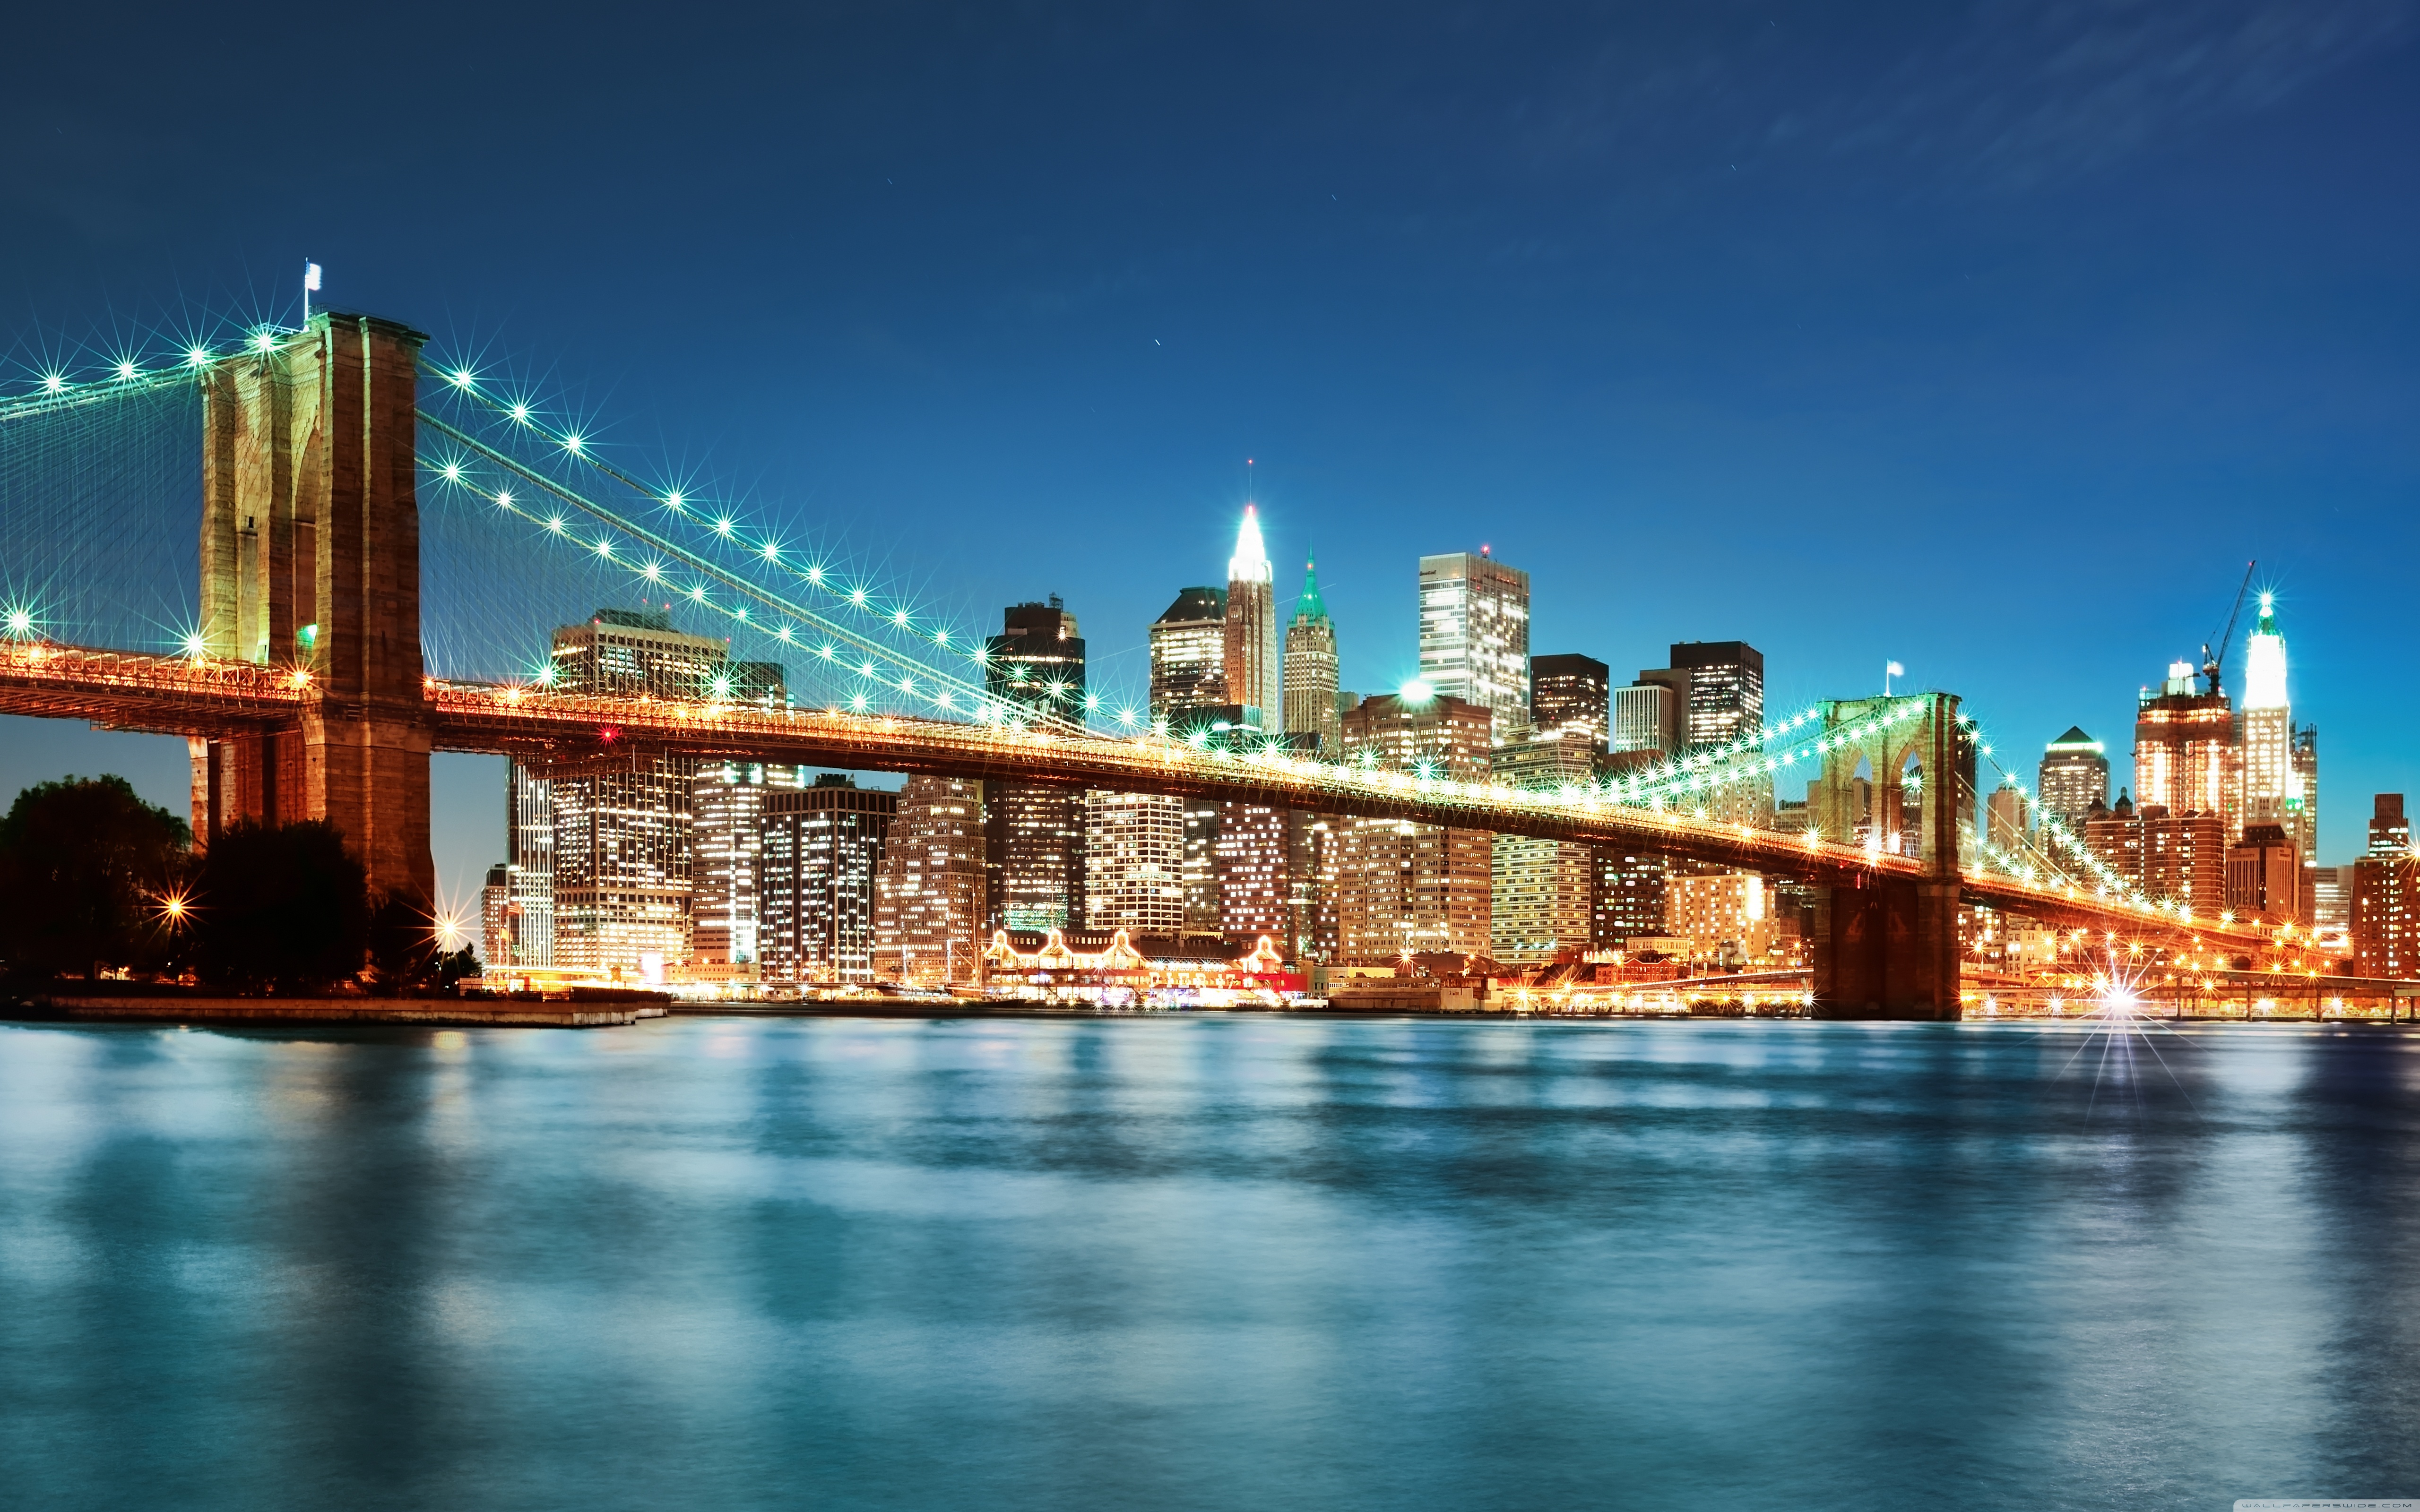 Brooklyn Bridge High Quality Wallpapers